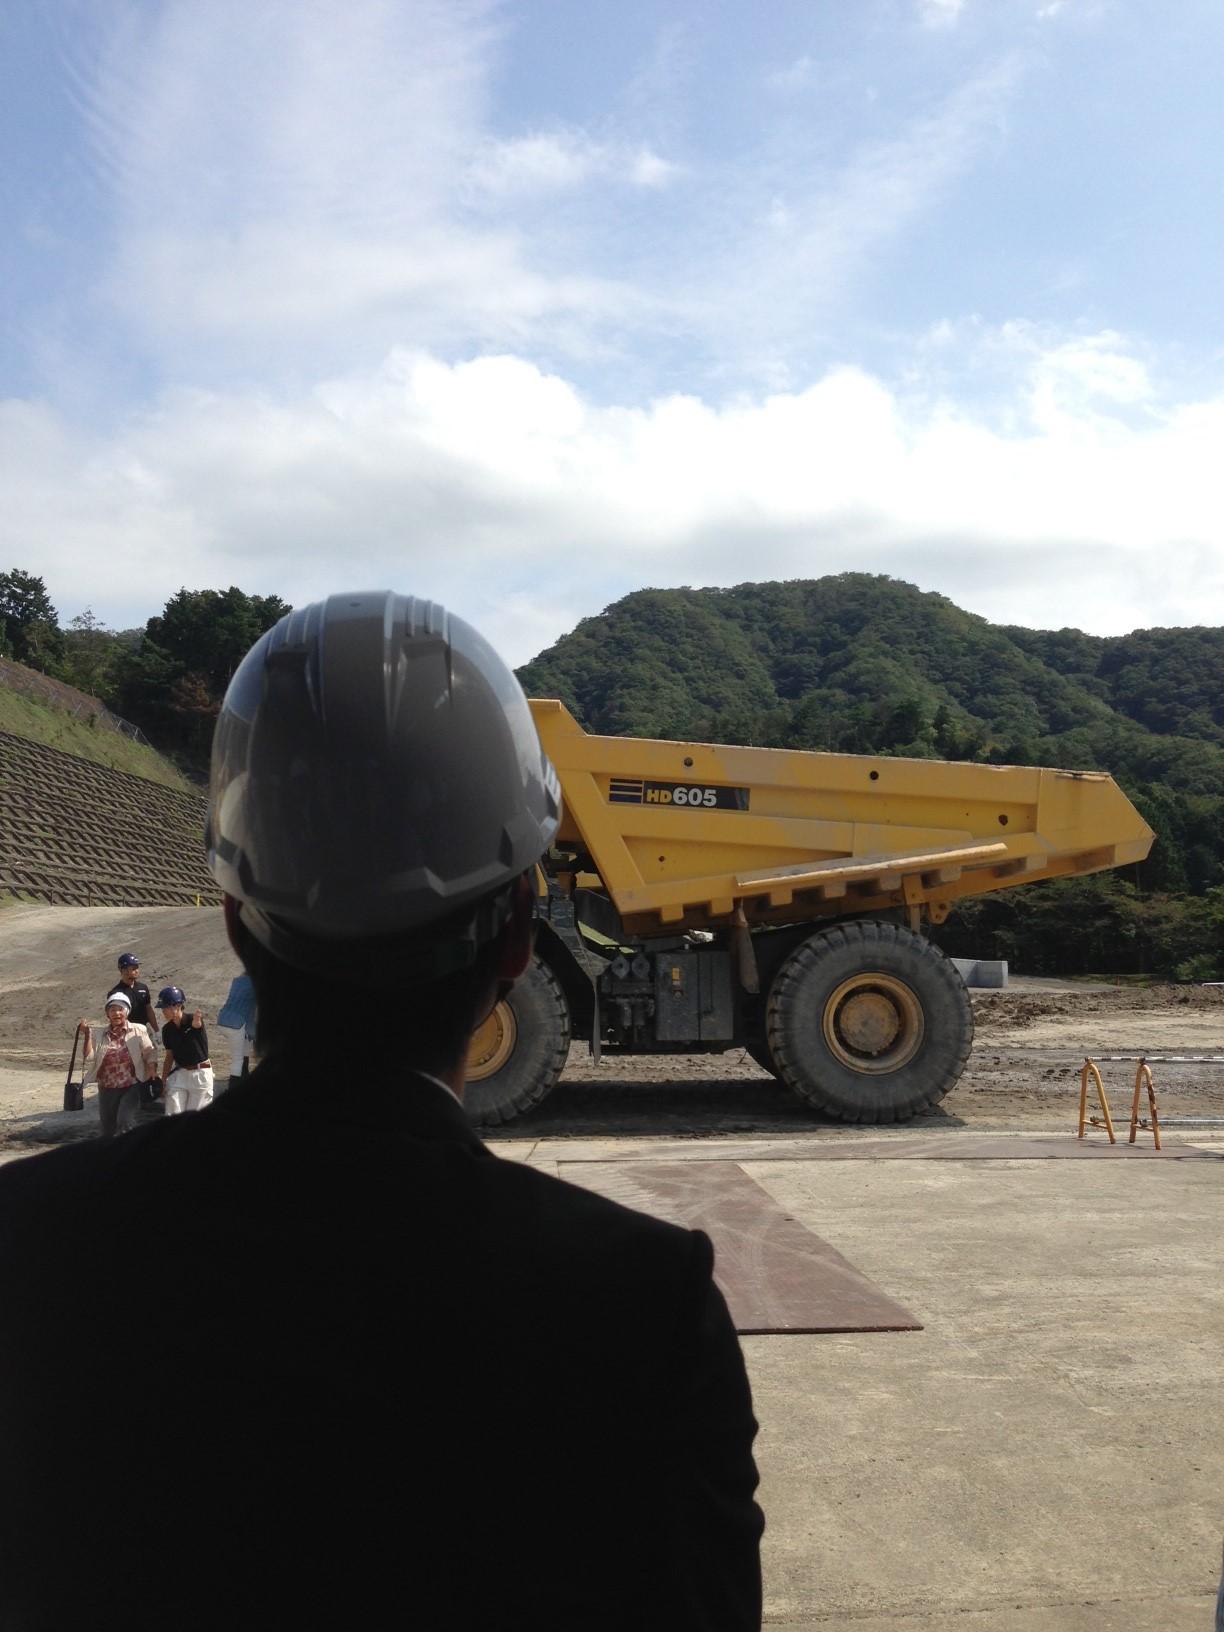 http://www.shonan-ls.co.jp/blog/landscape/img/1.JPG